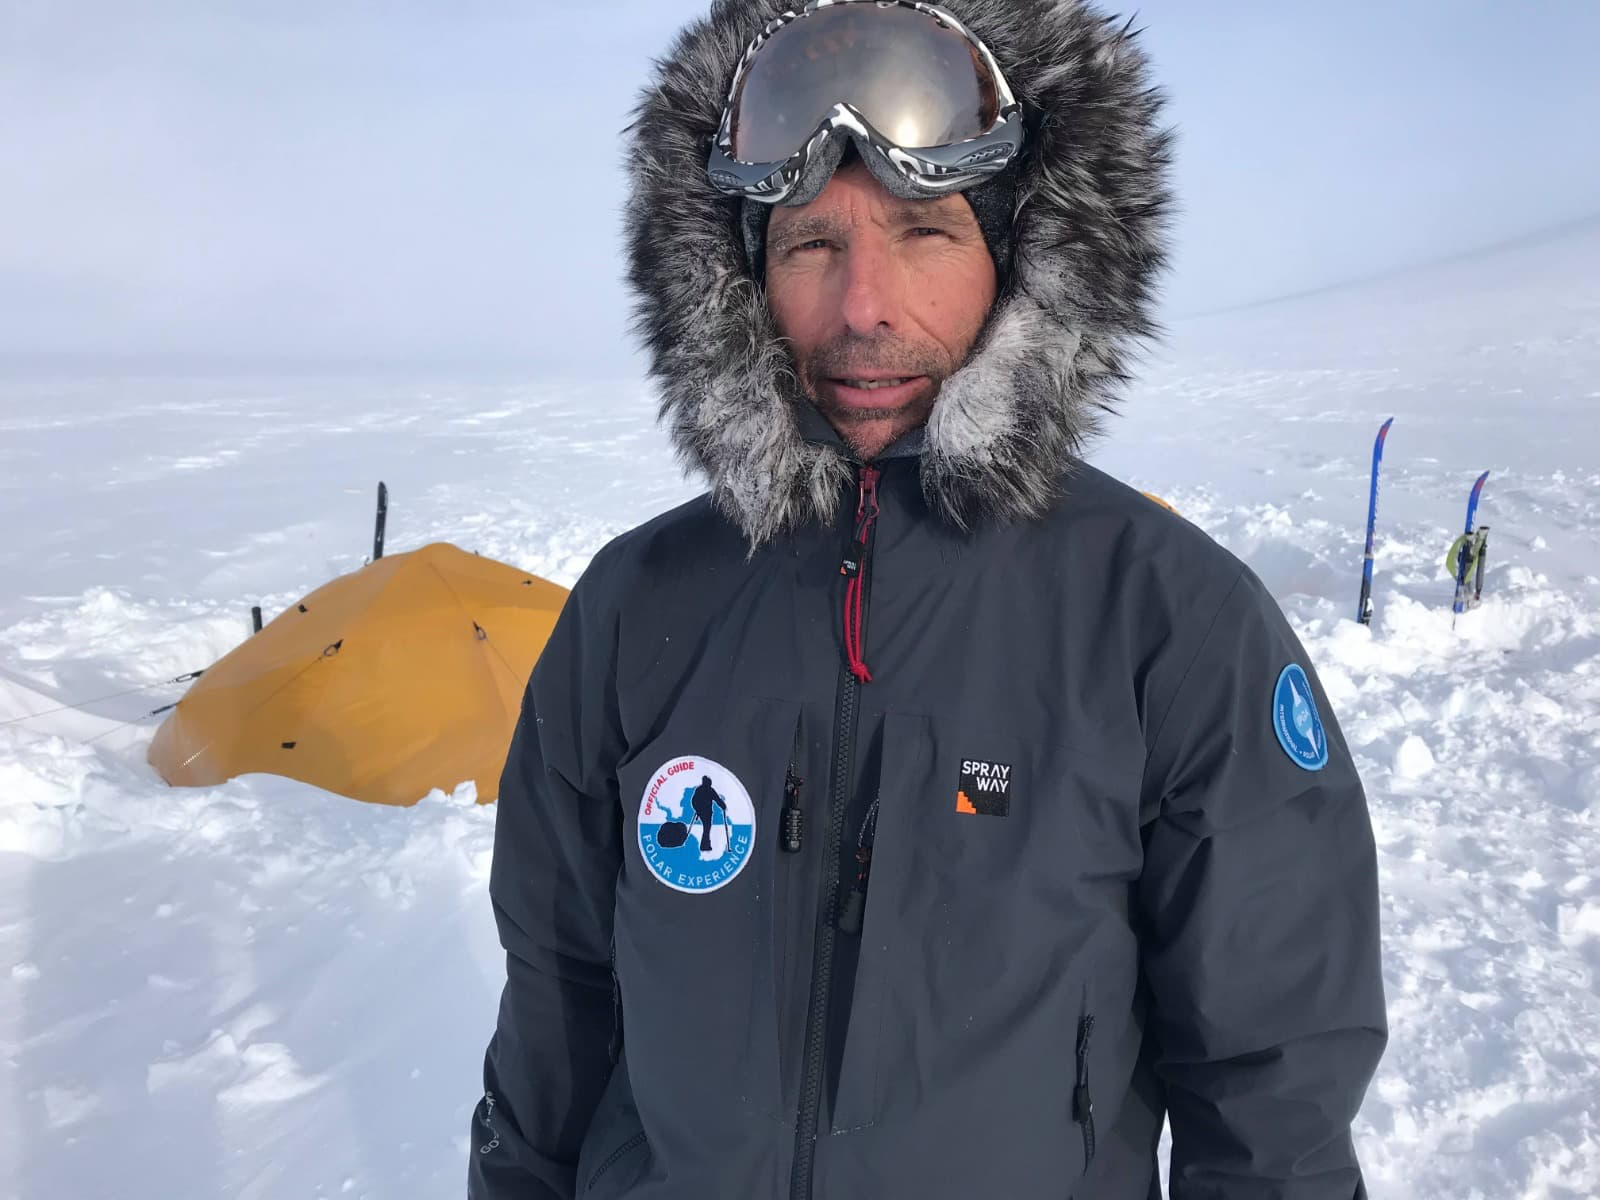 Dixie Dansercoer, killed, crevasse, Greenland